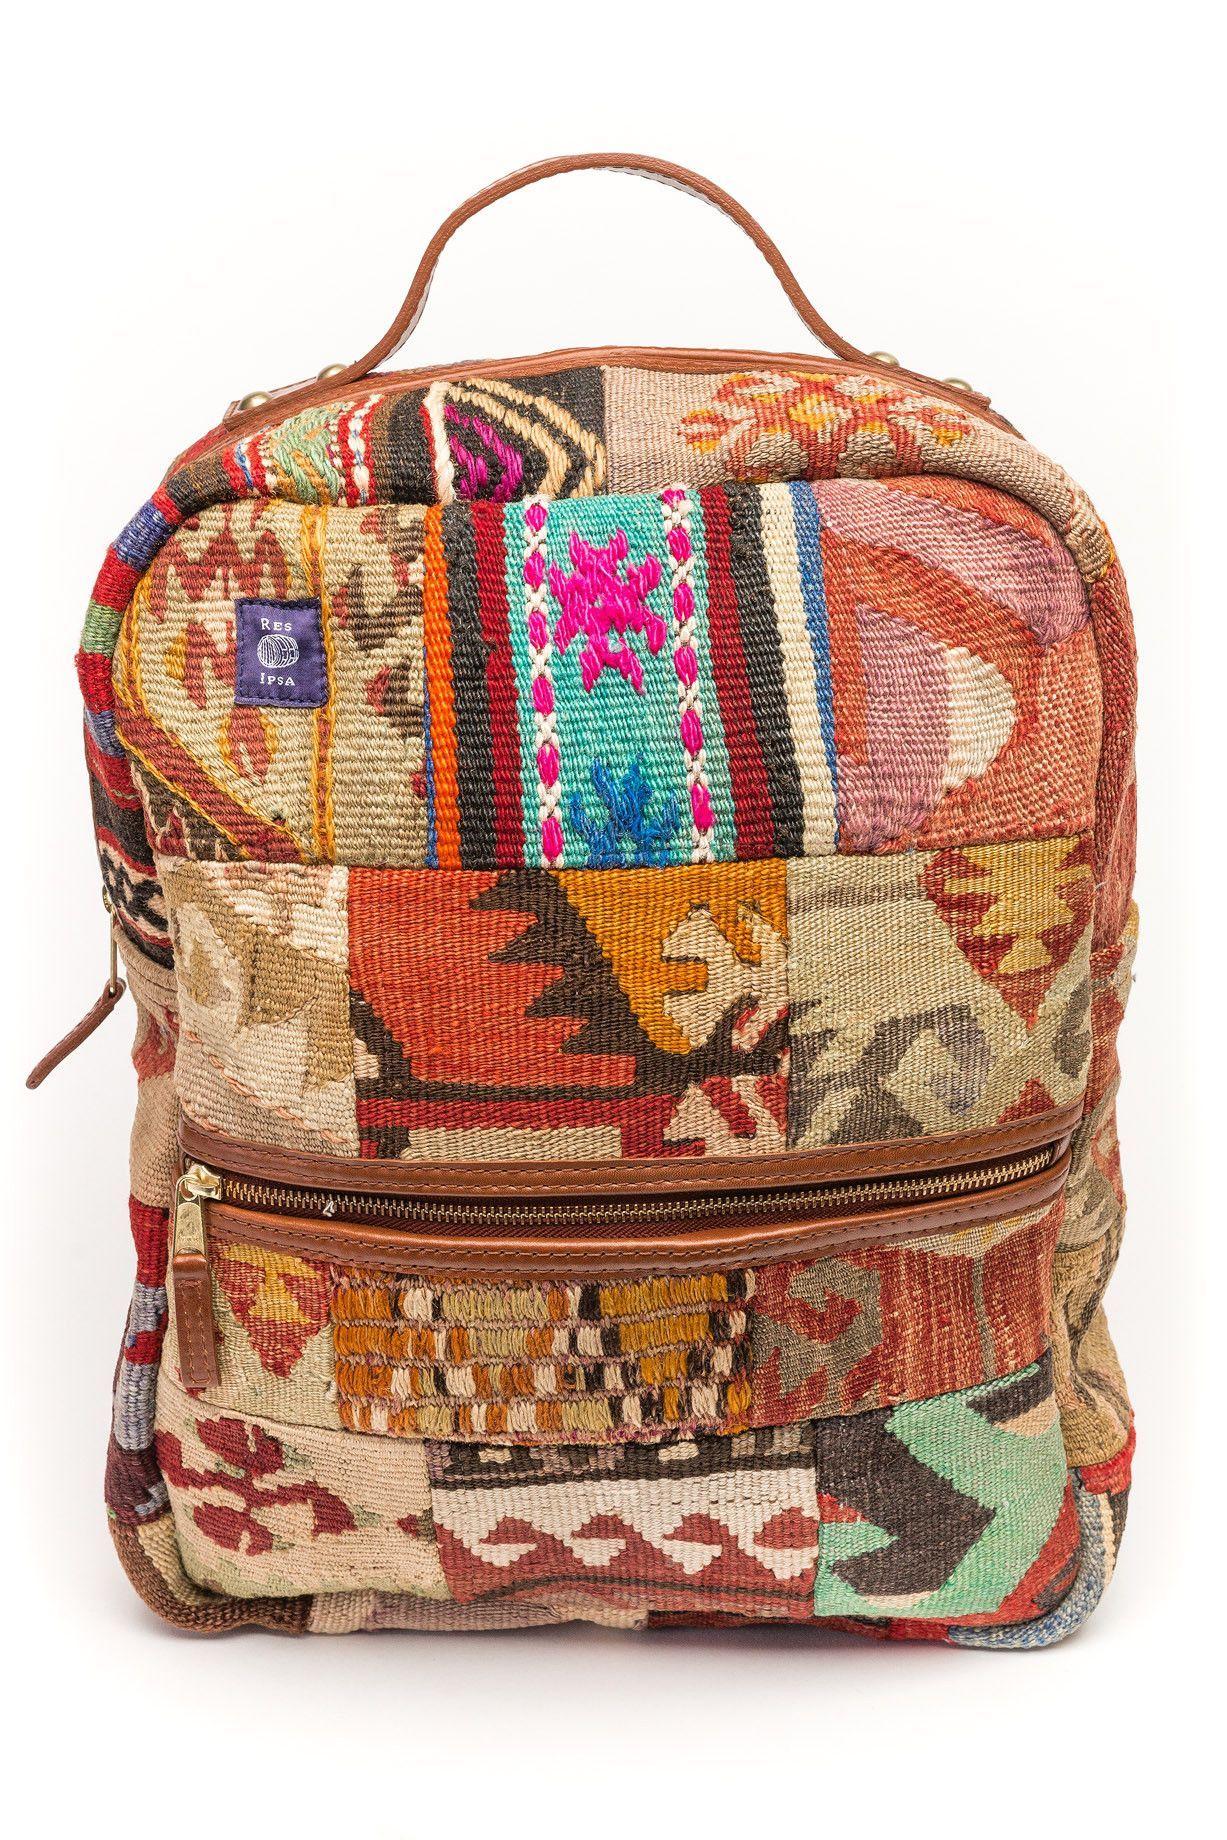 Kilim Backpack 9 Travel Bags Rugs